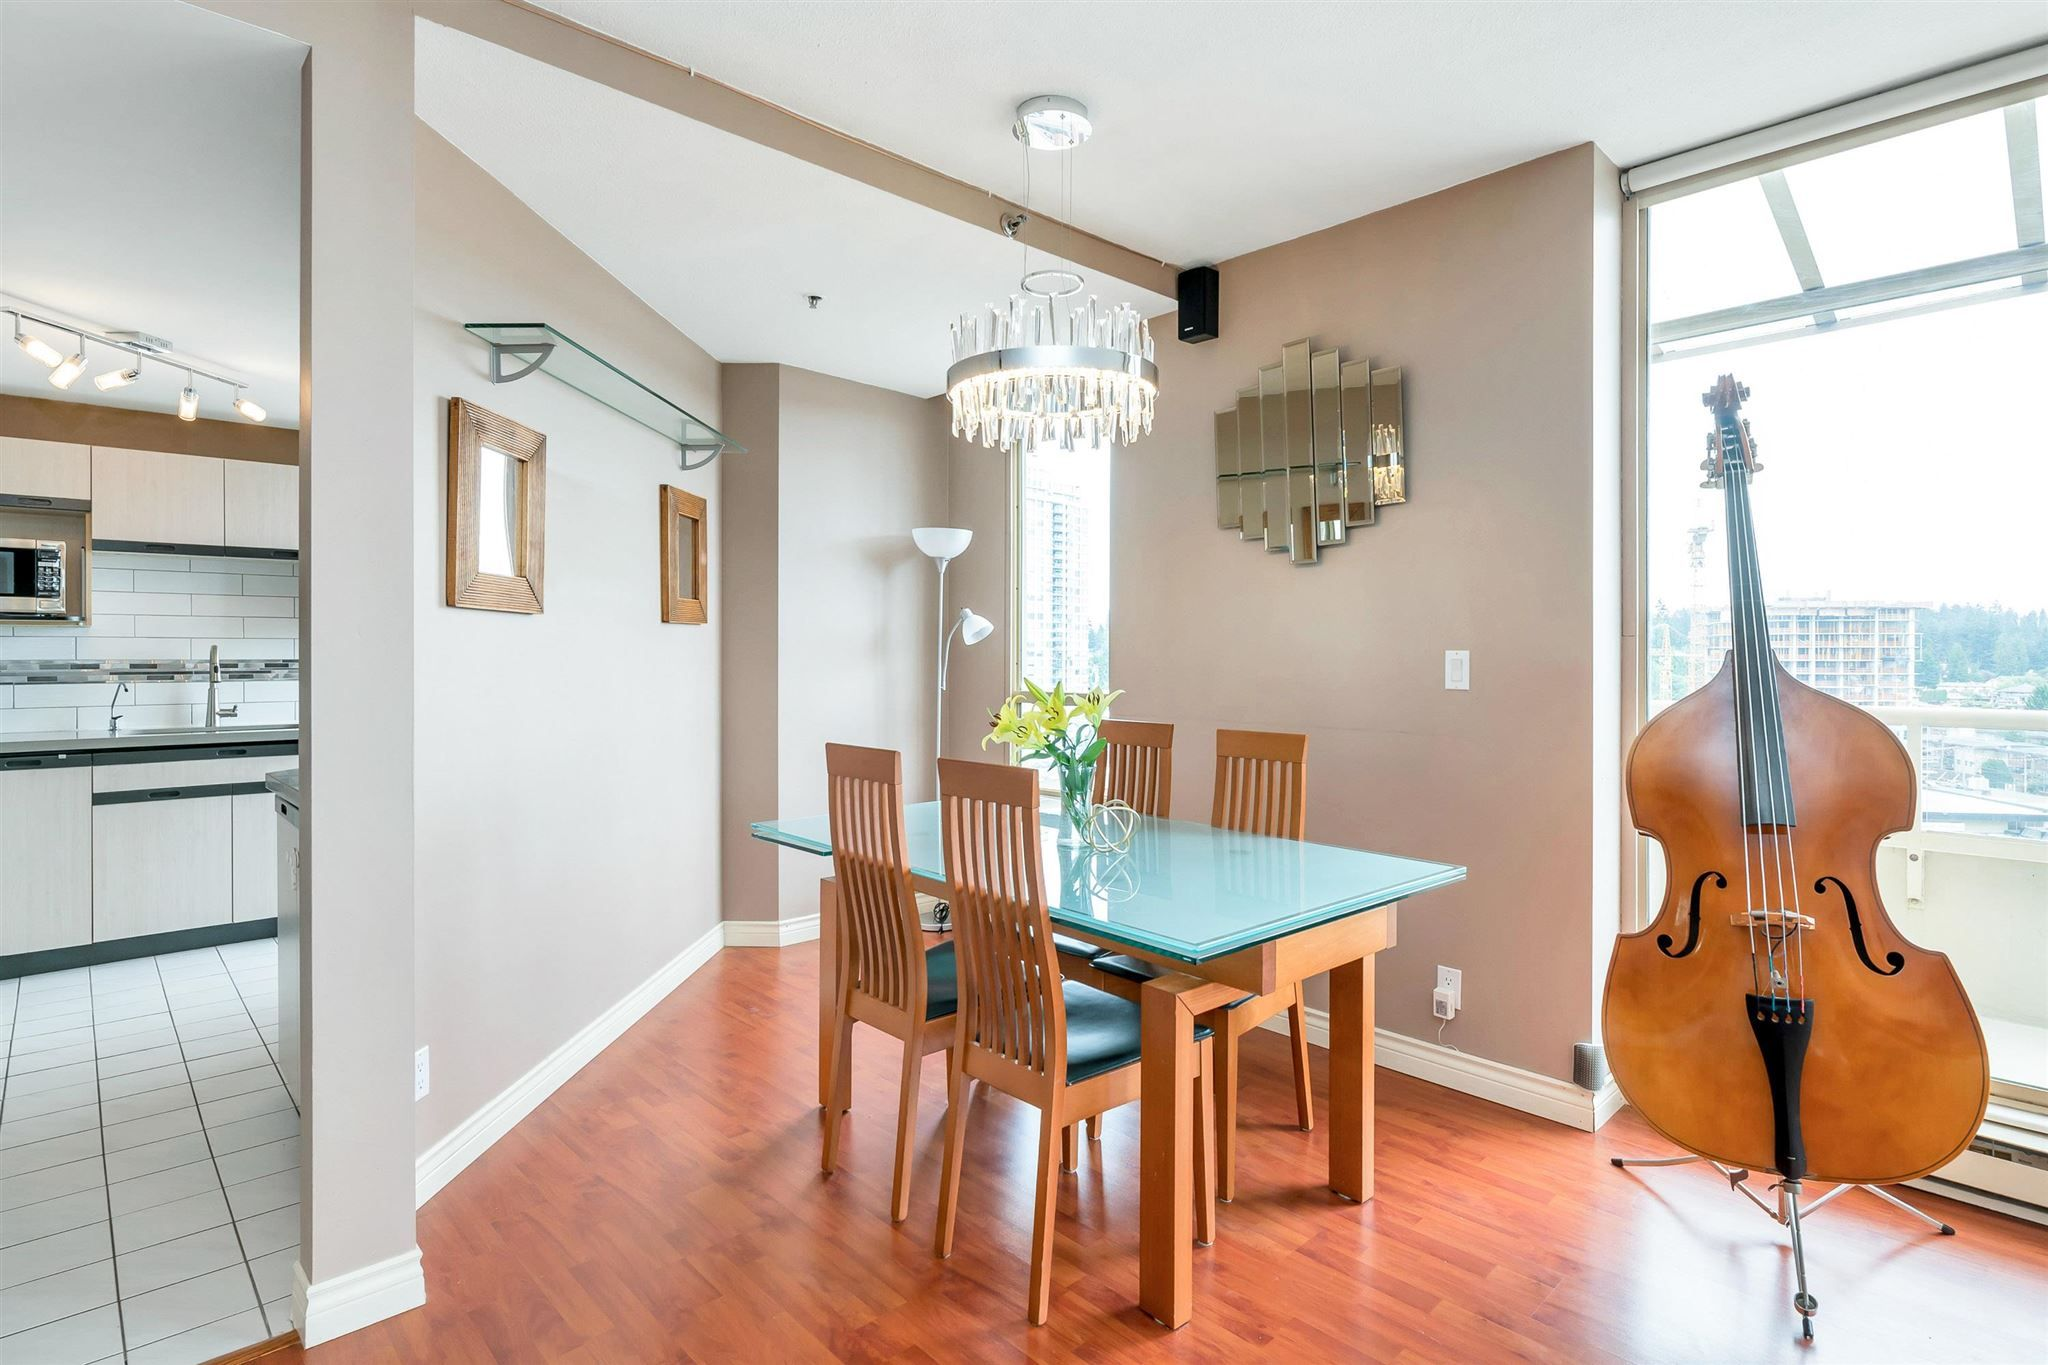 "Photo 6: Photos: 1401 728 FARROW Street in Coquitlam: Coquitlam West Condo for sale in ""THE VICTORIA"" : MLS®# R2615321"